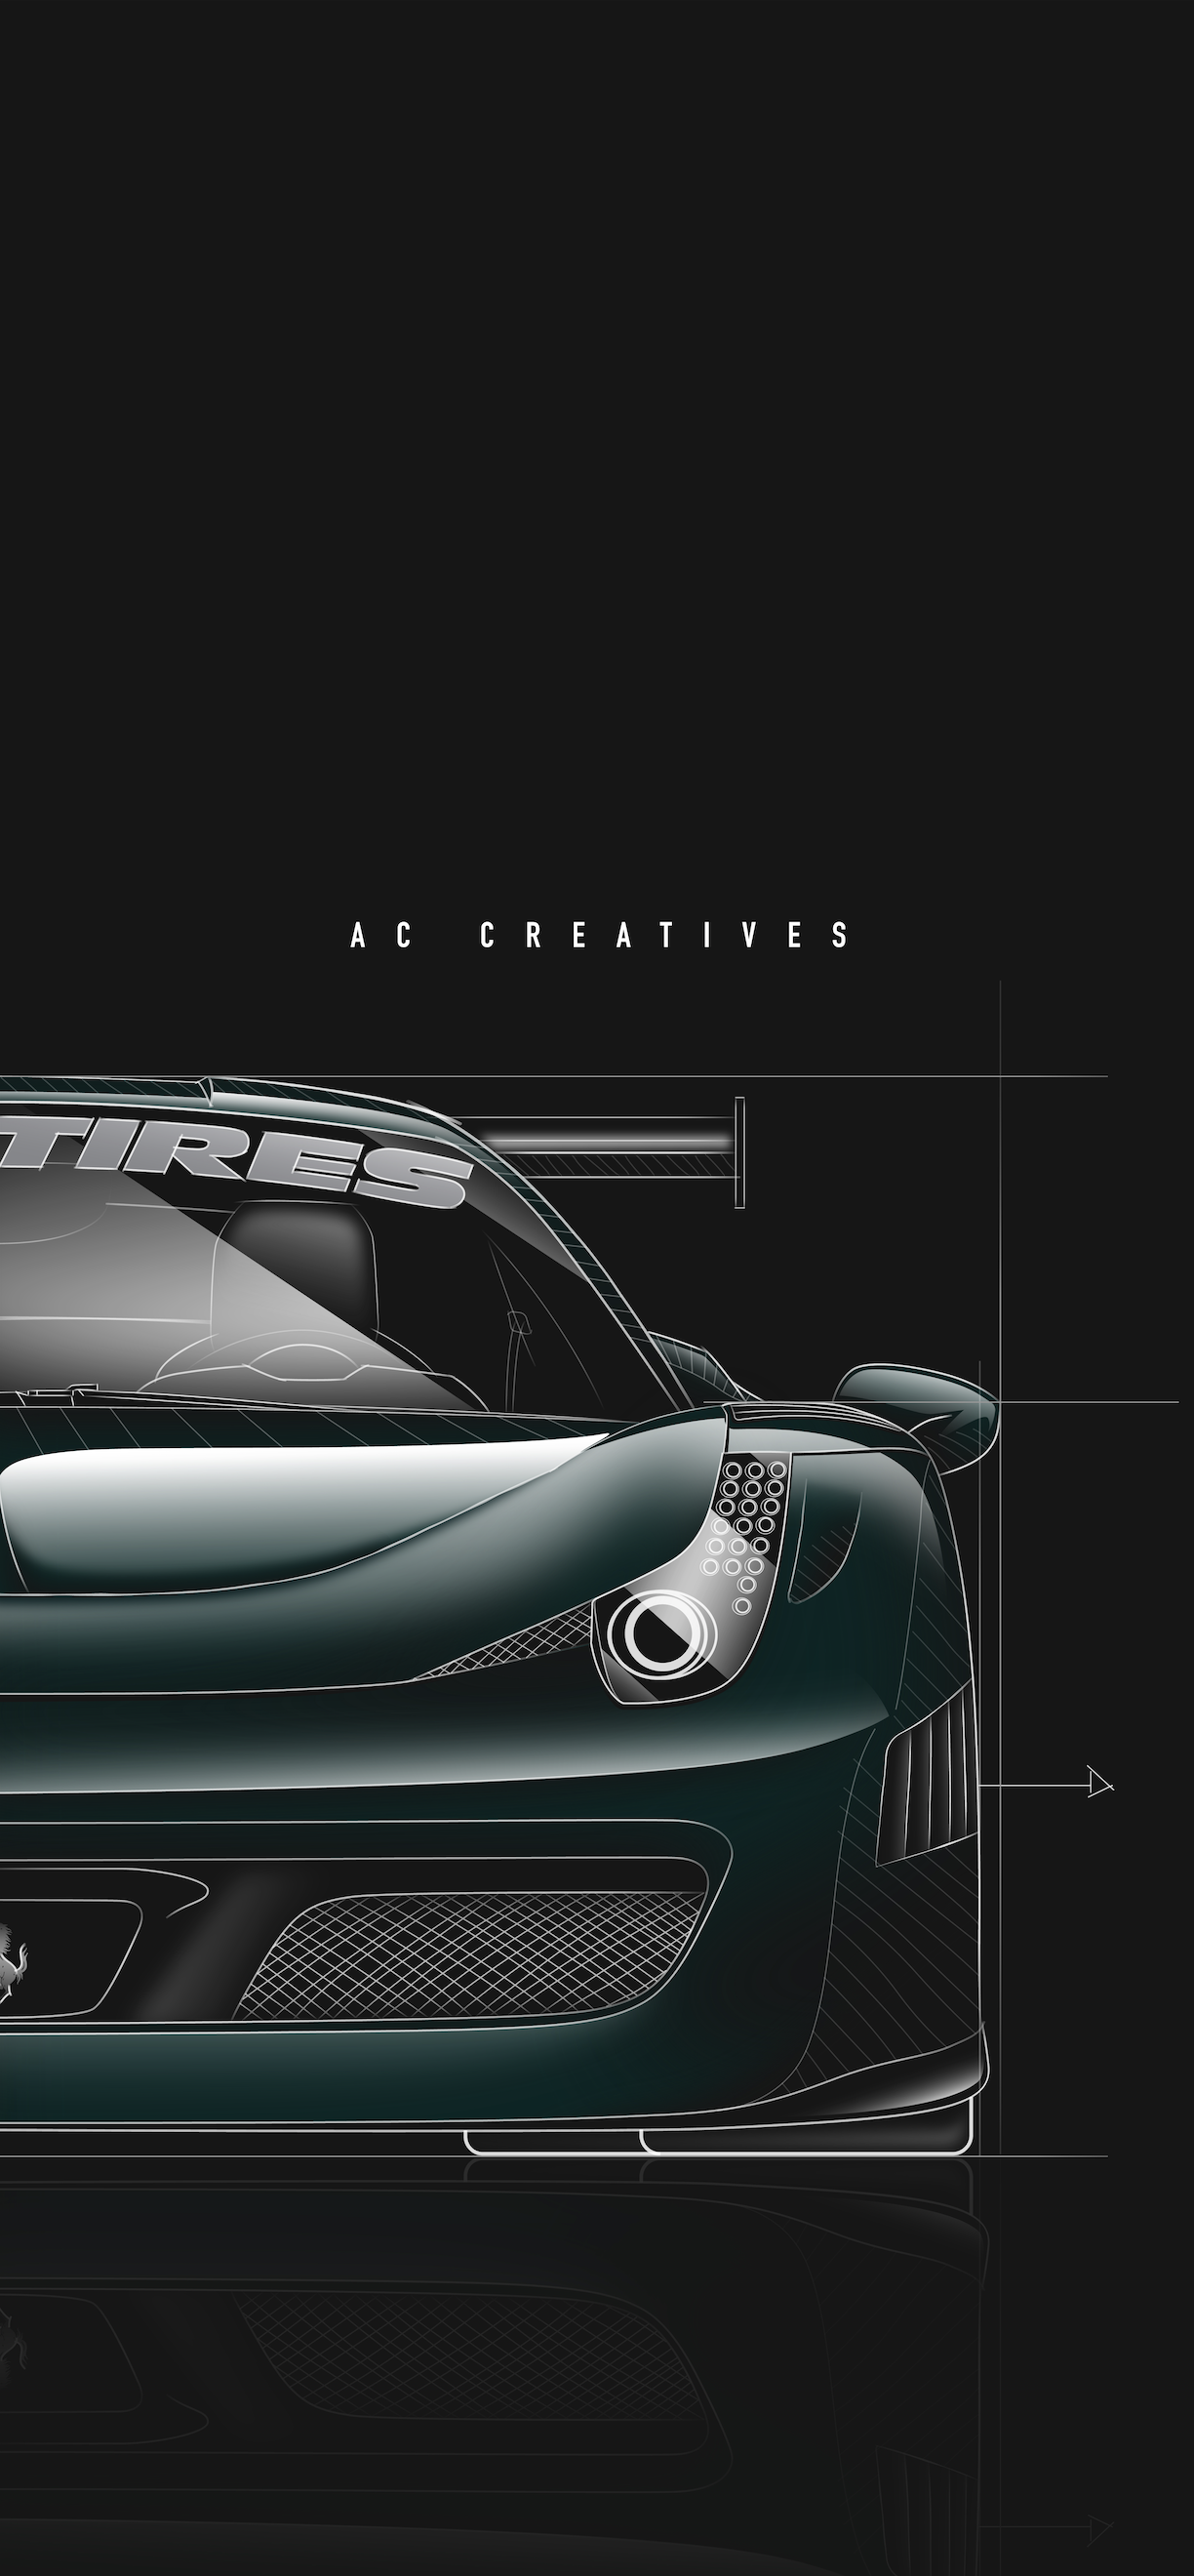 Tj Hunt Ferrari Wallpaper Ac Creatives Graphic Design Illustration